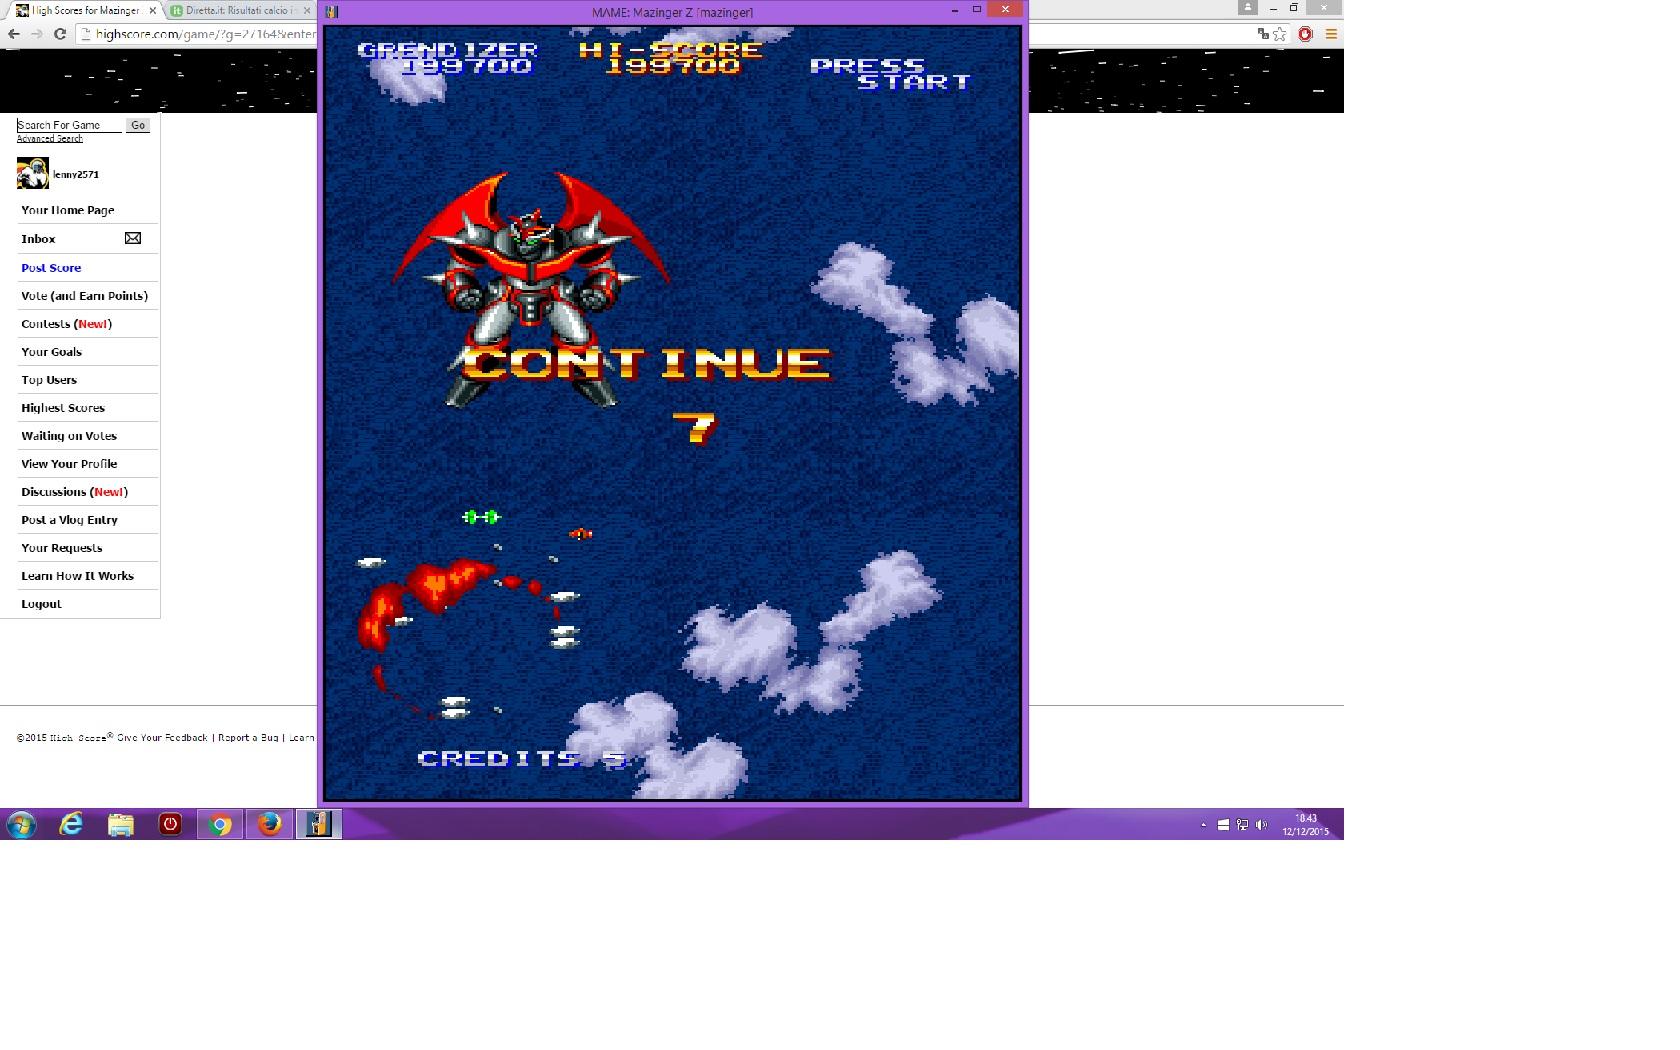 lenny2571: Mazinger Z [World] [mazinger] (Arcade Emulated / M.A.M.E.) 199,700 points on 2015-12-12 11:44:30